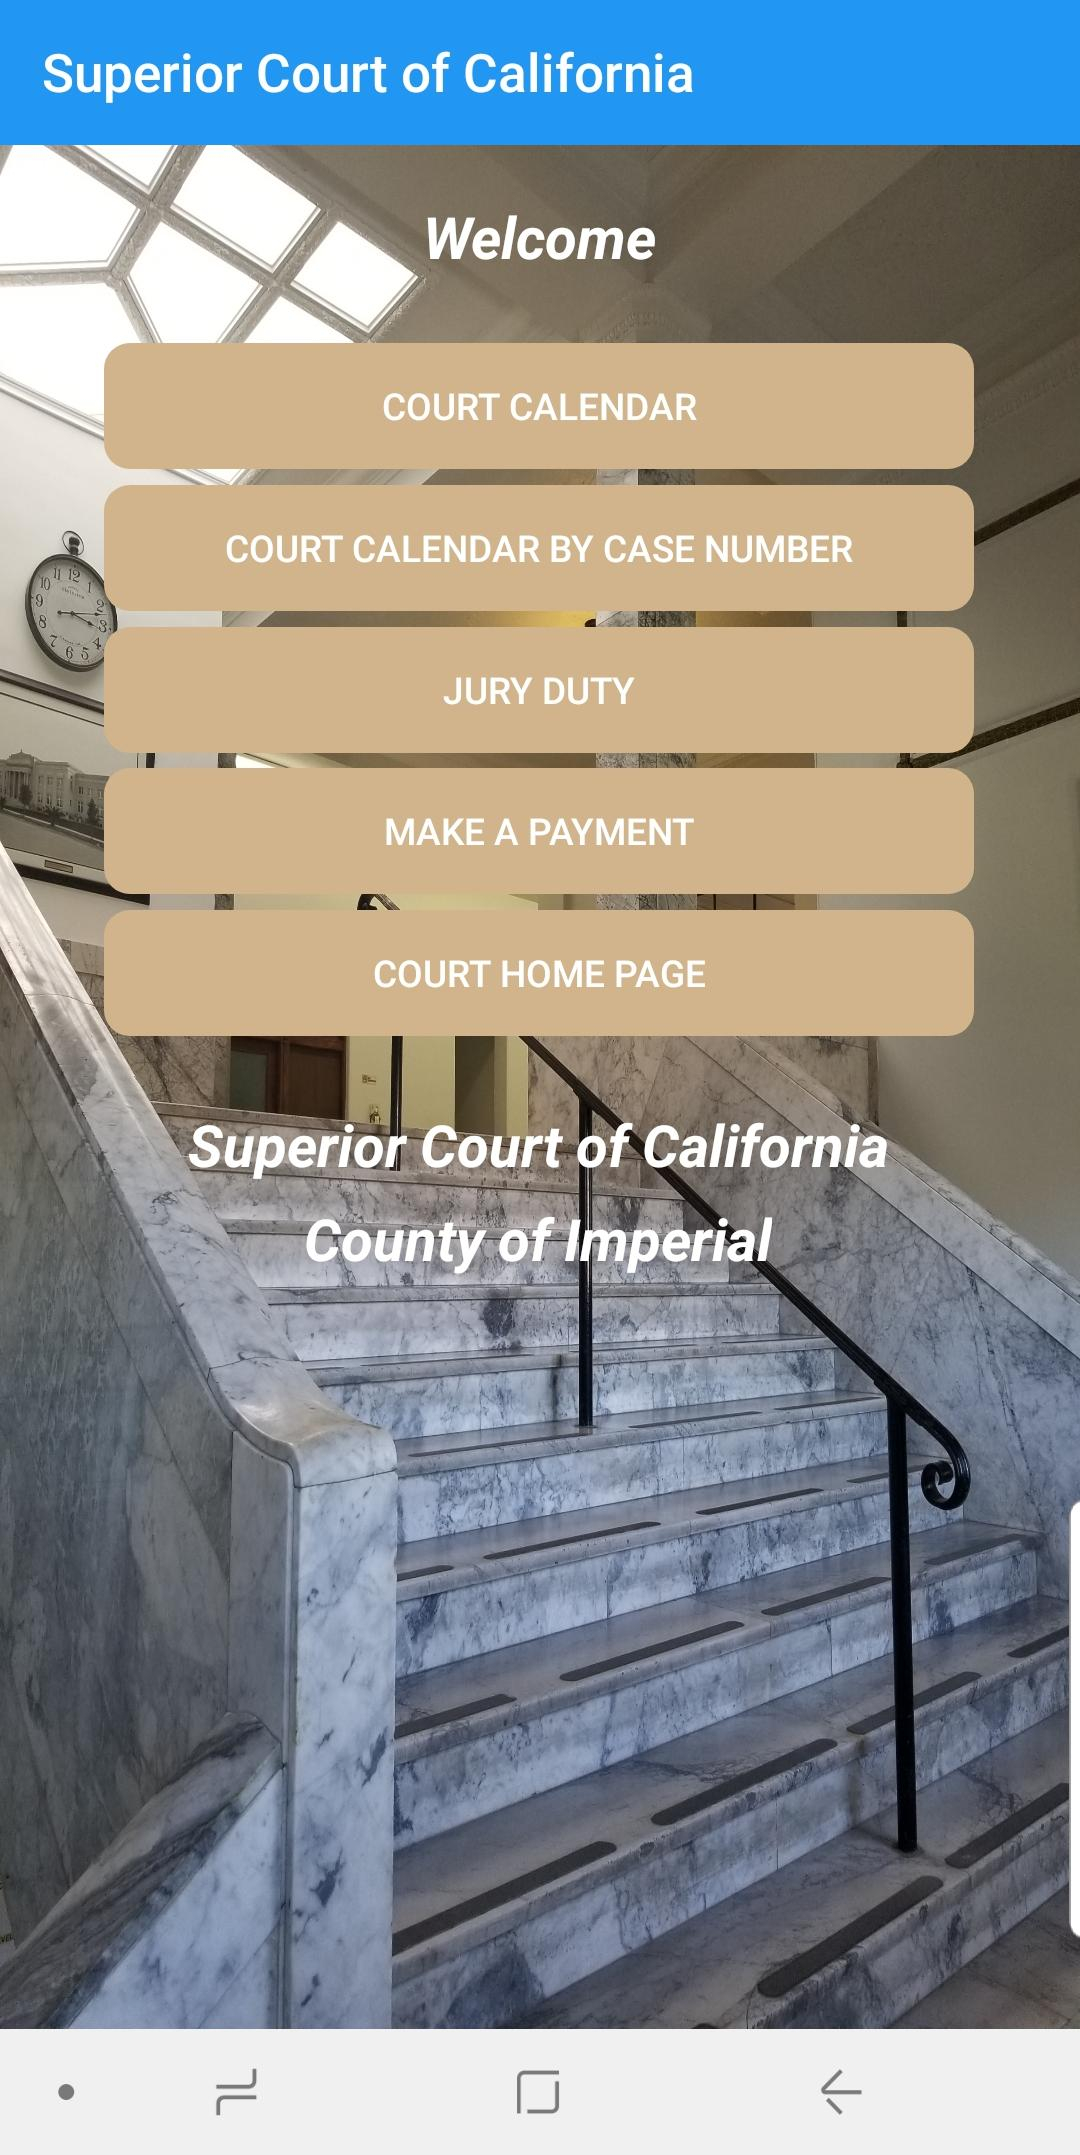 Superior Court Of Ca Imperial Для Андроид - Скачать Apk with Imperial County Superior Court Calendars